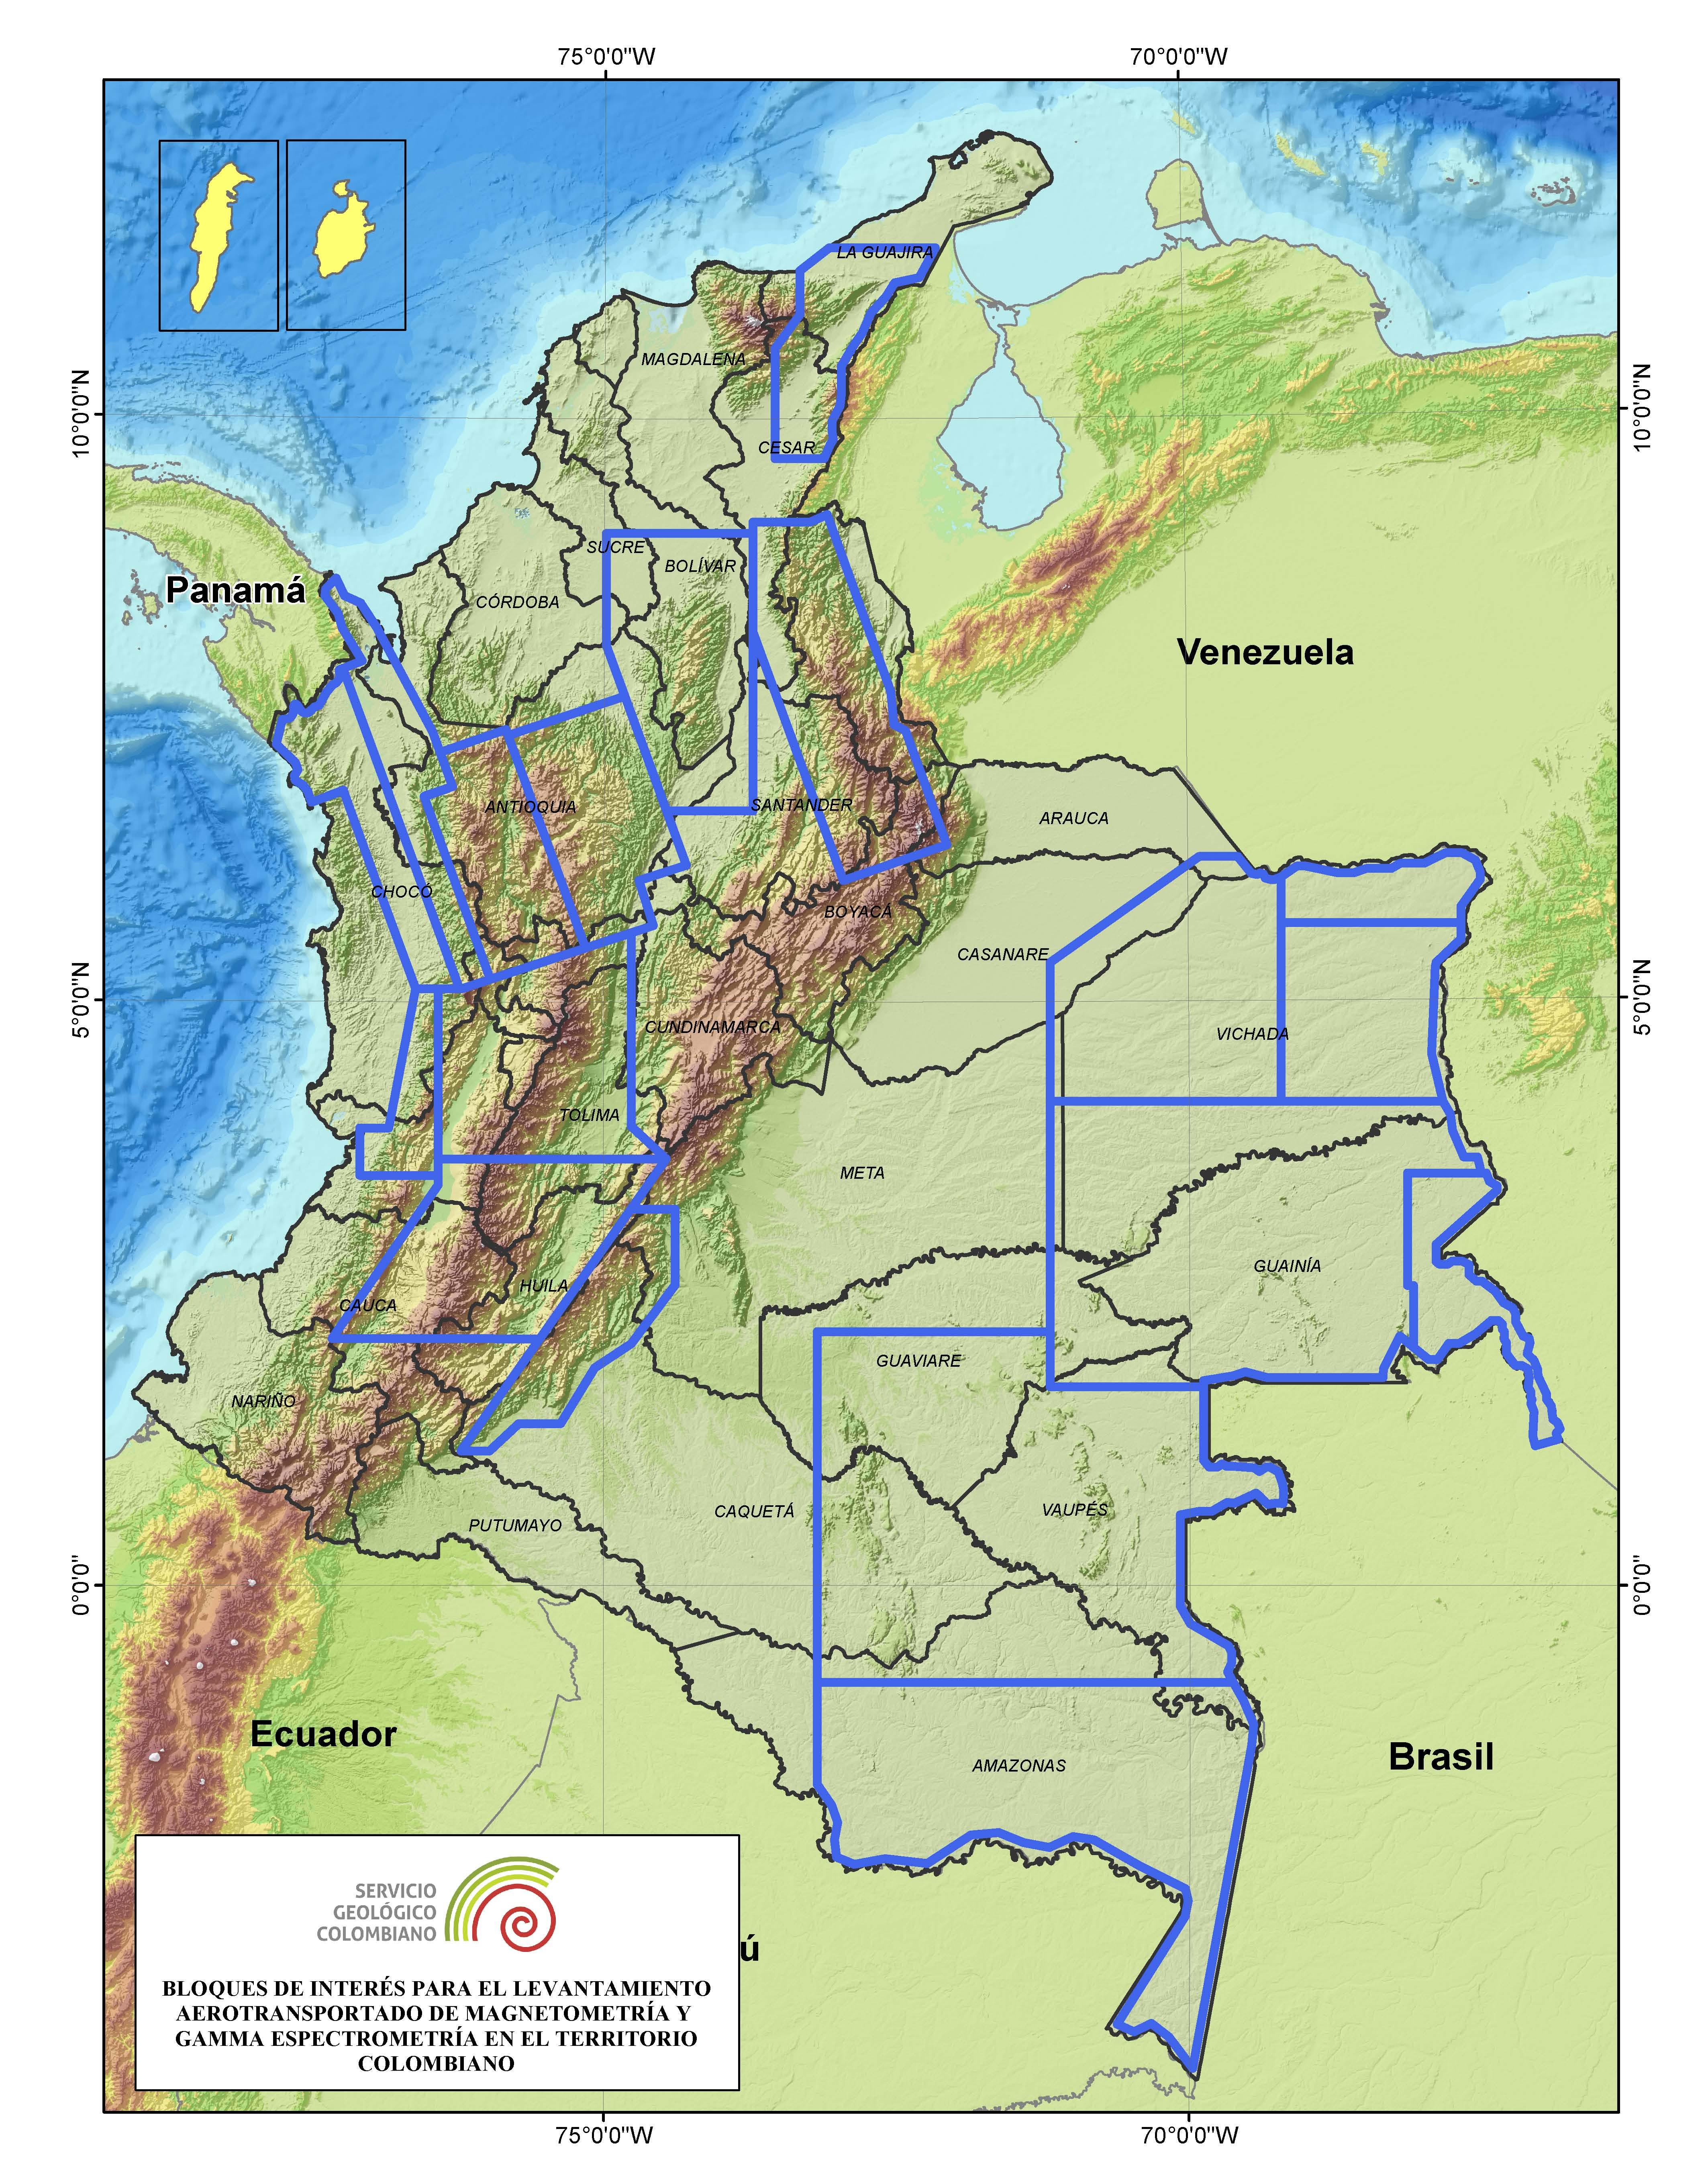 mapa colombia Mapa Geofísico de Colombia mapa colombia